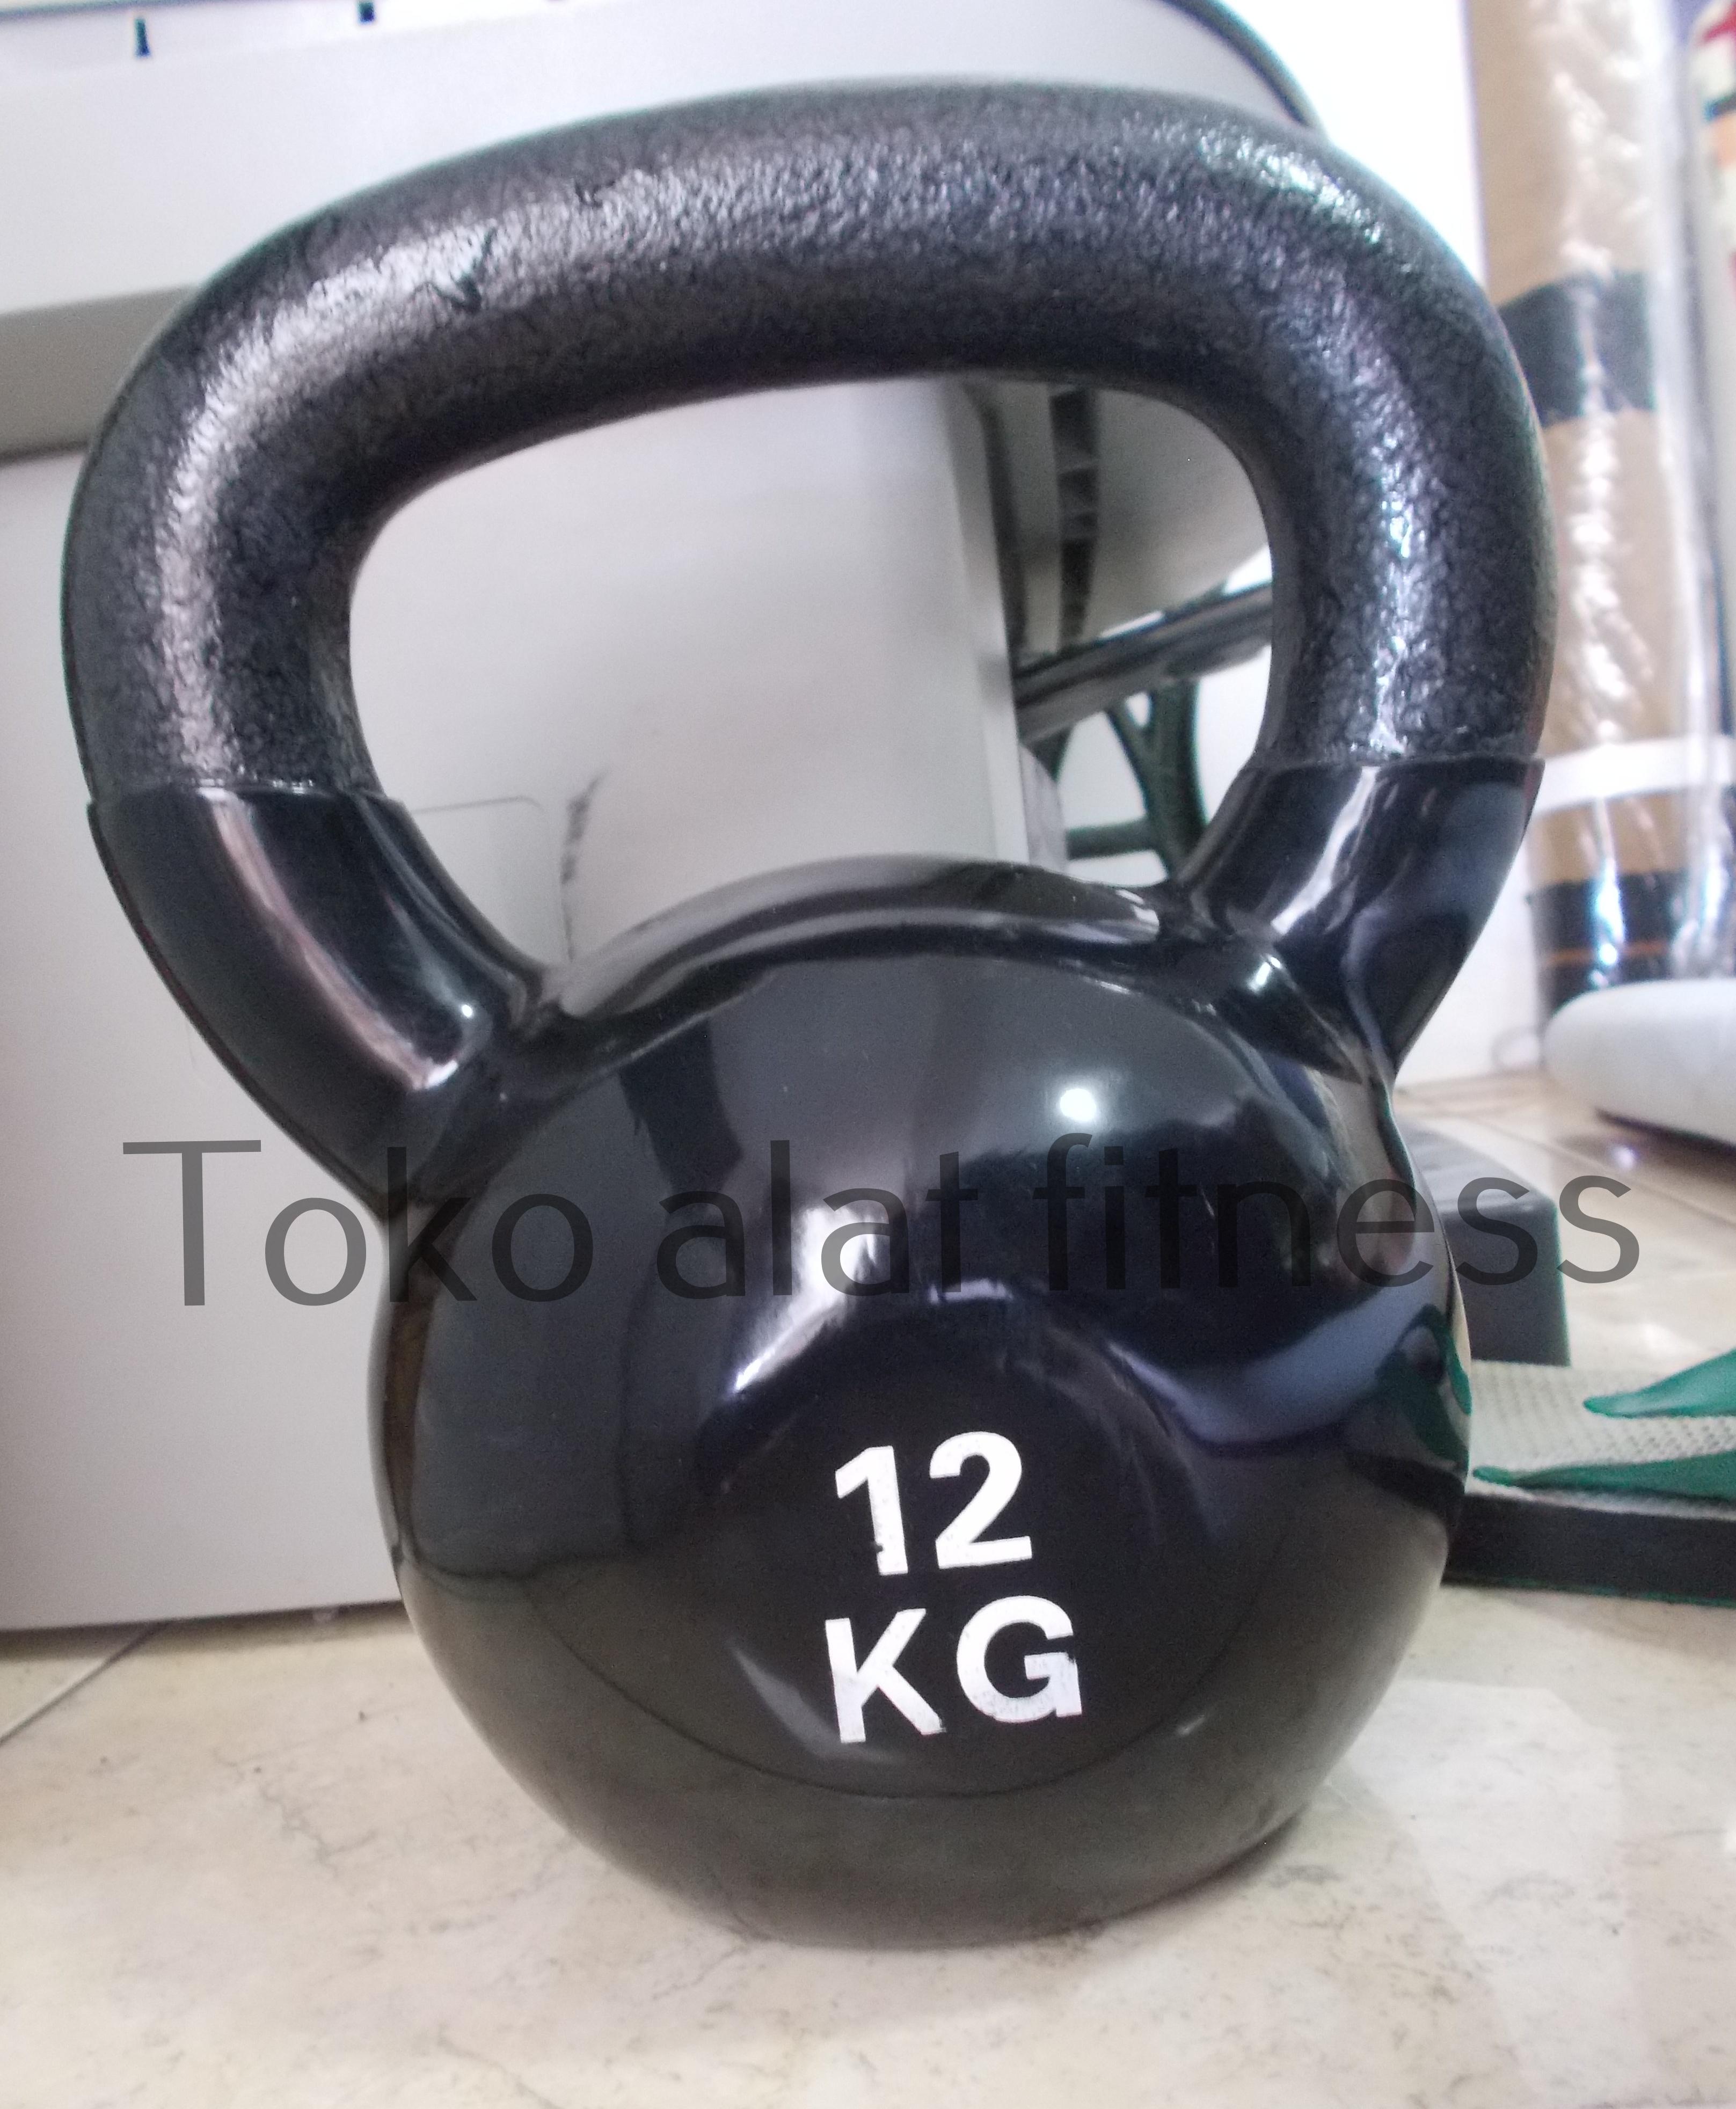 Kettlebell Vynil 12kg Body Gym - Kettlebell Vinyl 12kg (Import) Hitam Body Gym